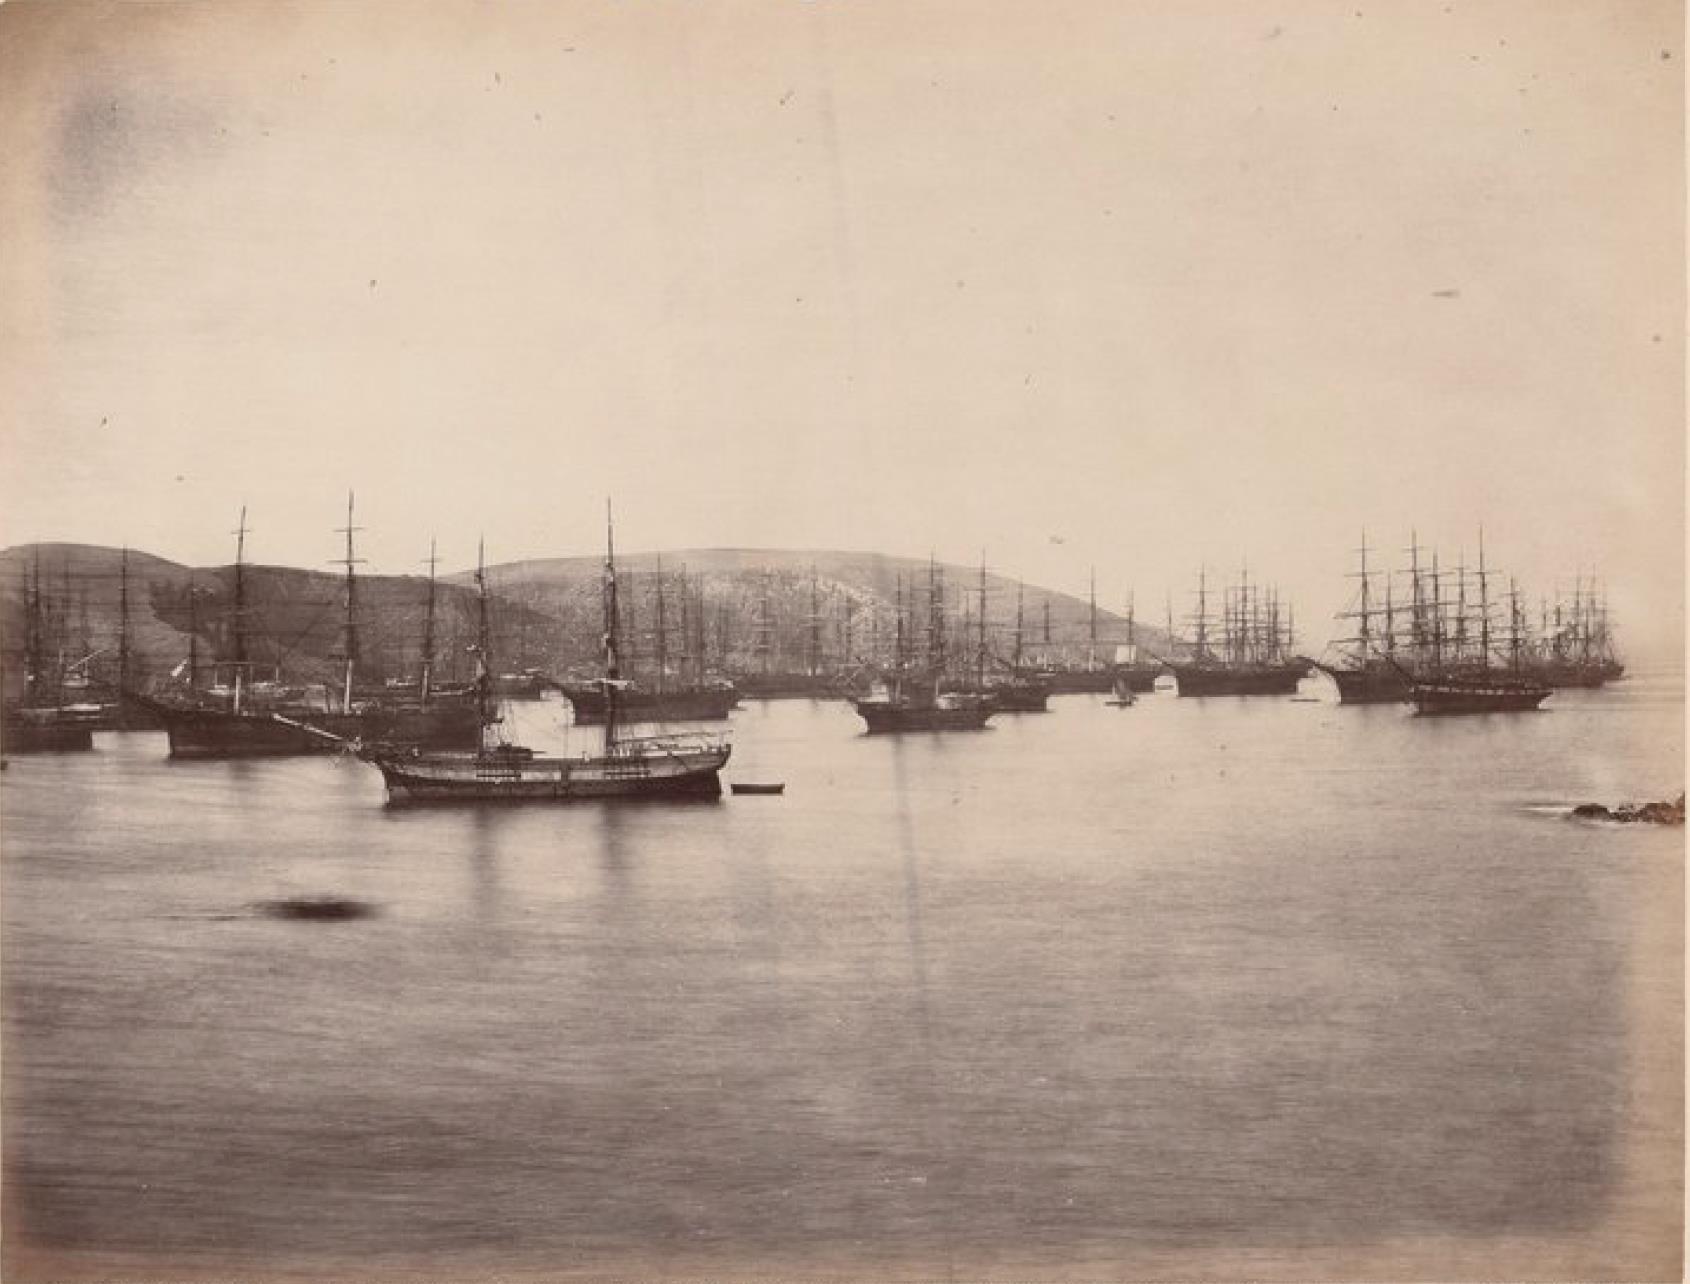 Острова Чинча. Панорама Среднего Чинча. Корабли, ожидающие груза гуано (2)